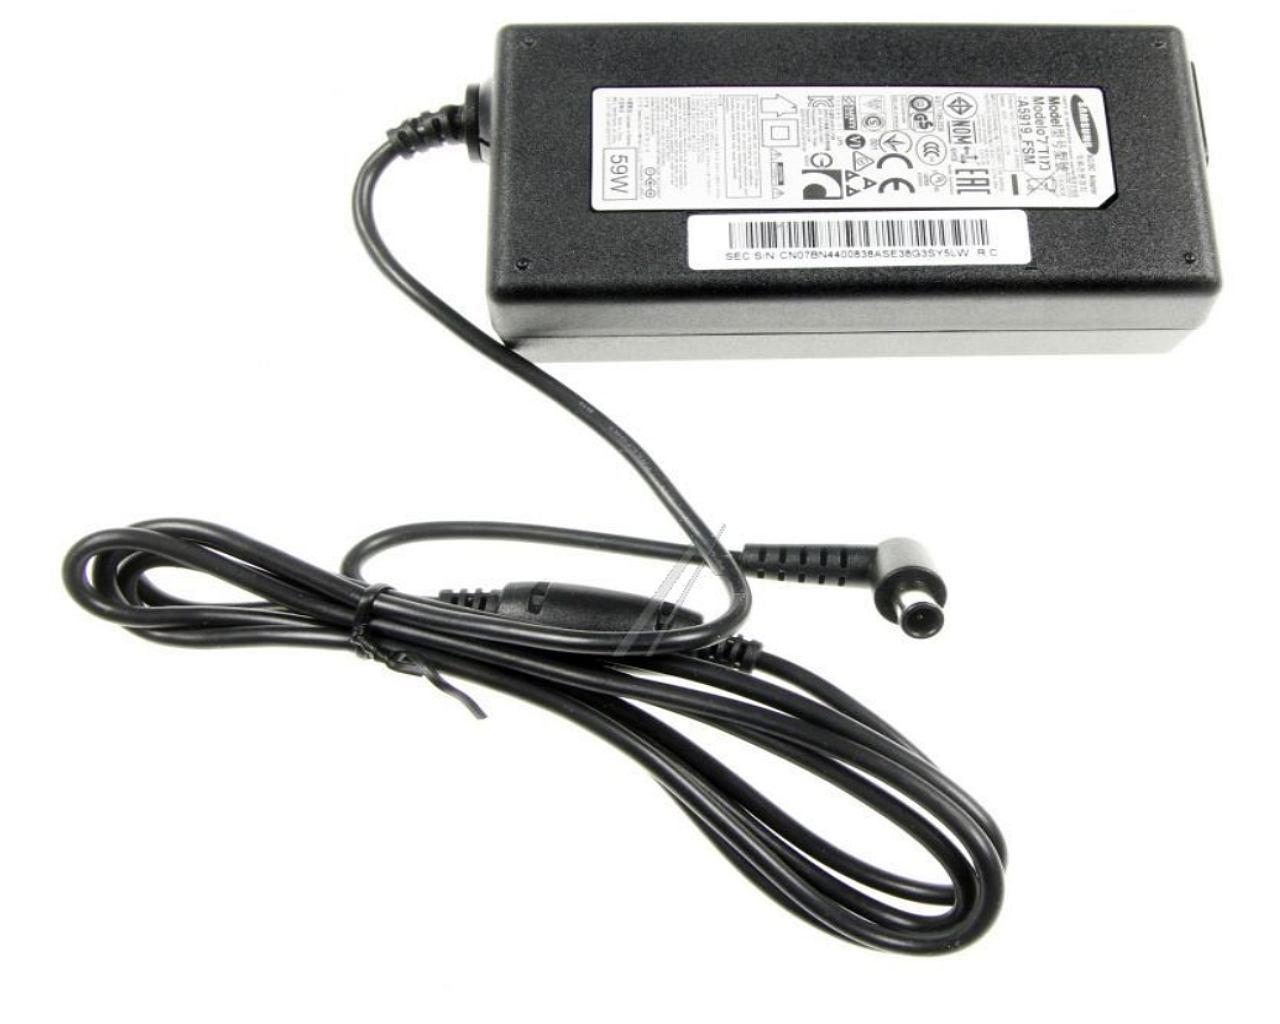 anténní napaječ 12V / 300mA s výhybkou konektor IEC / na kabel